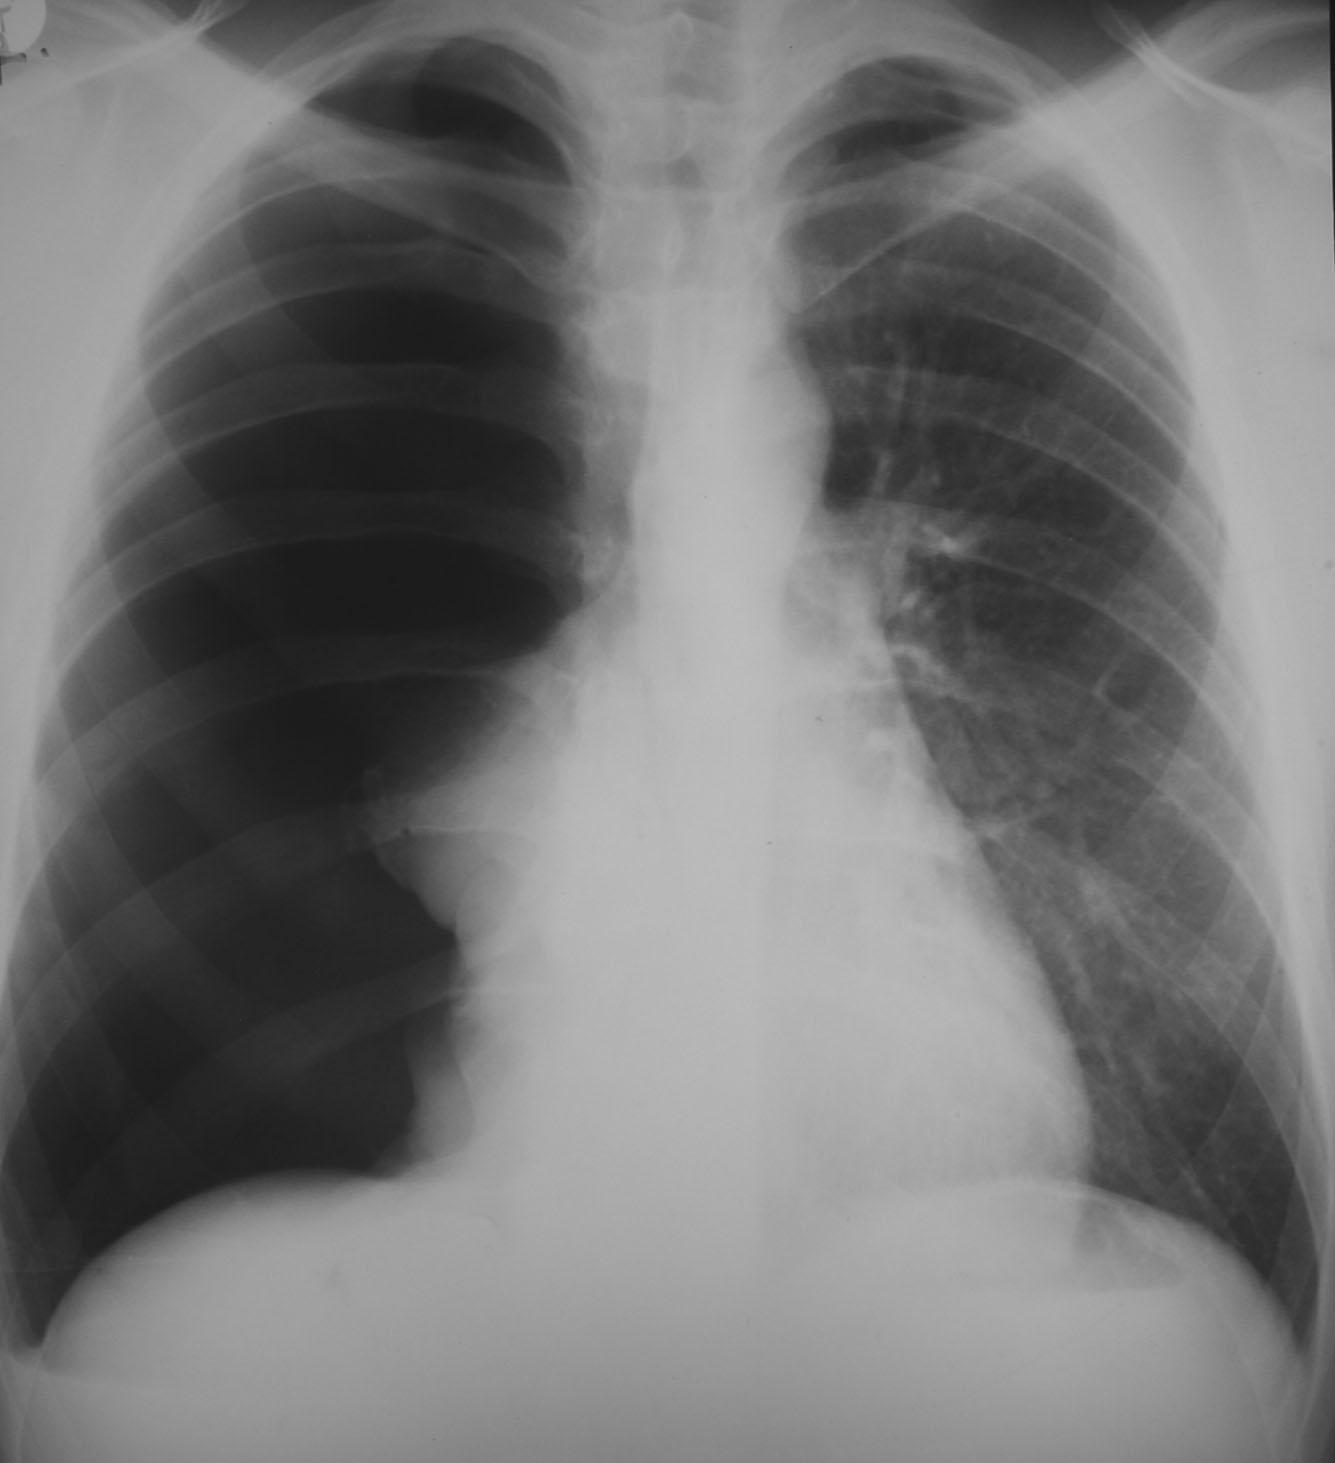 Pneumothorax X-ray